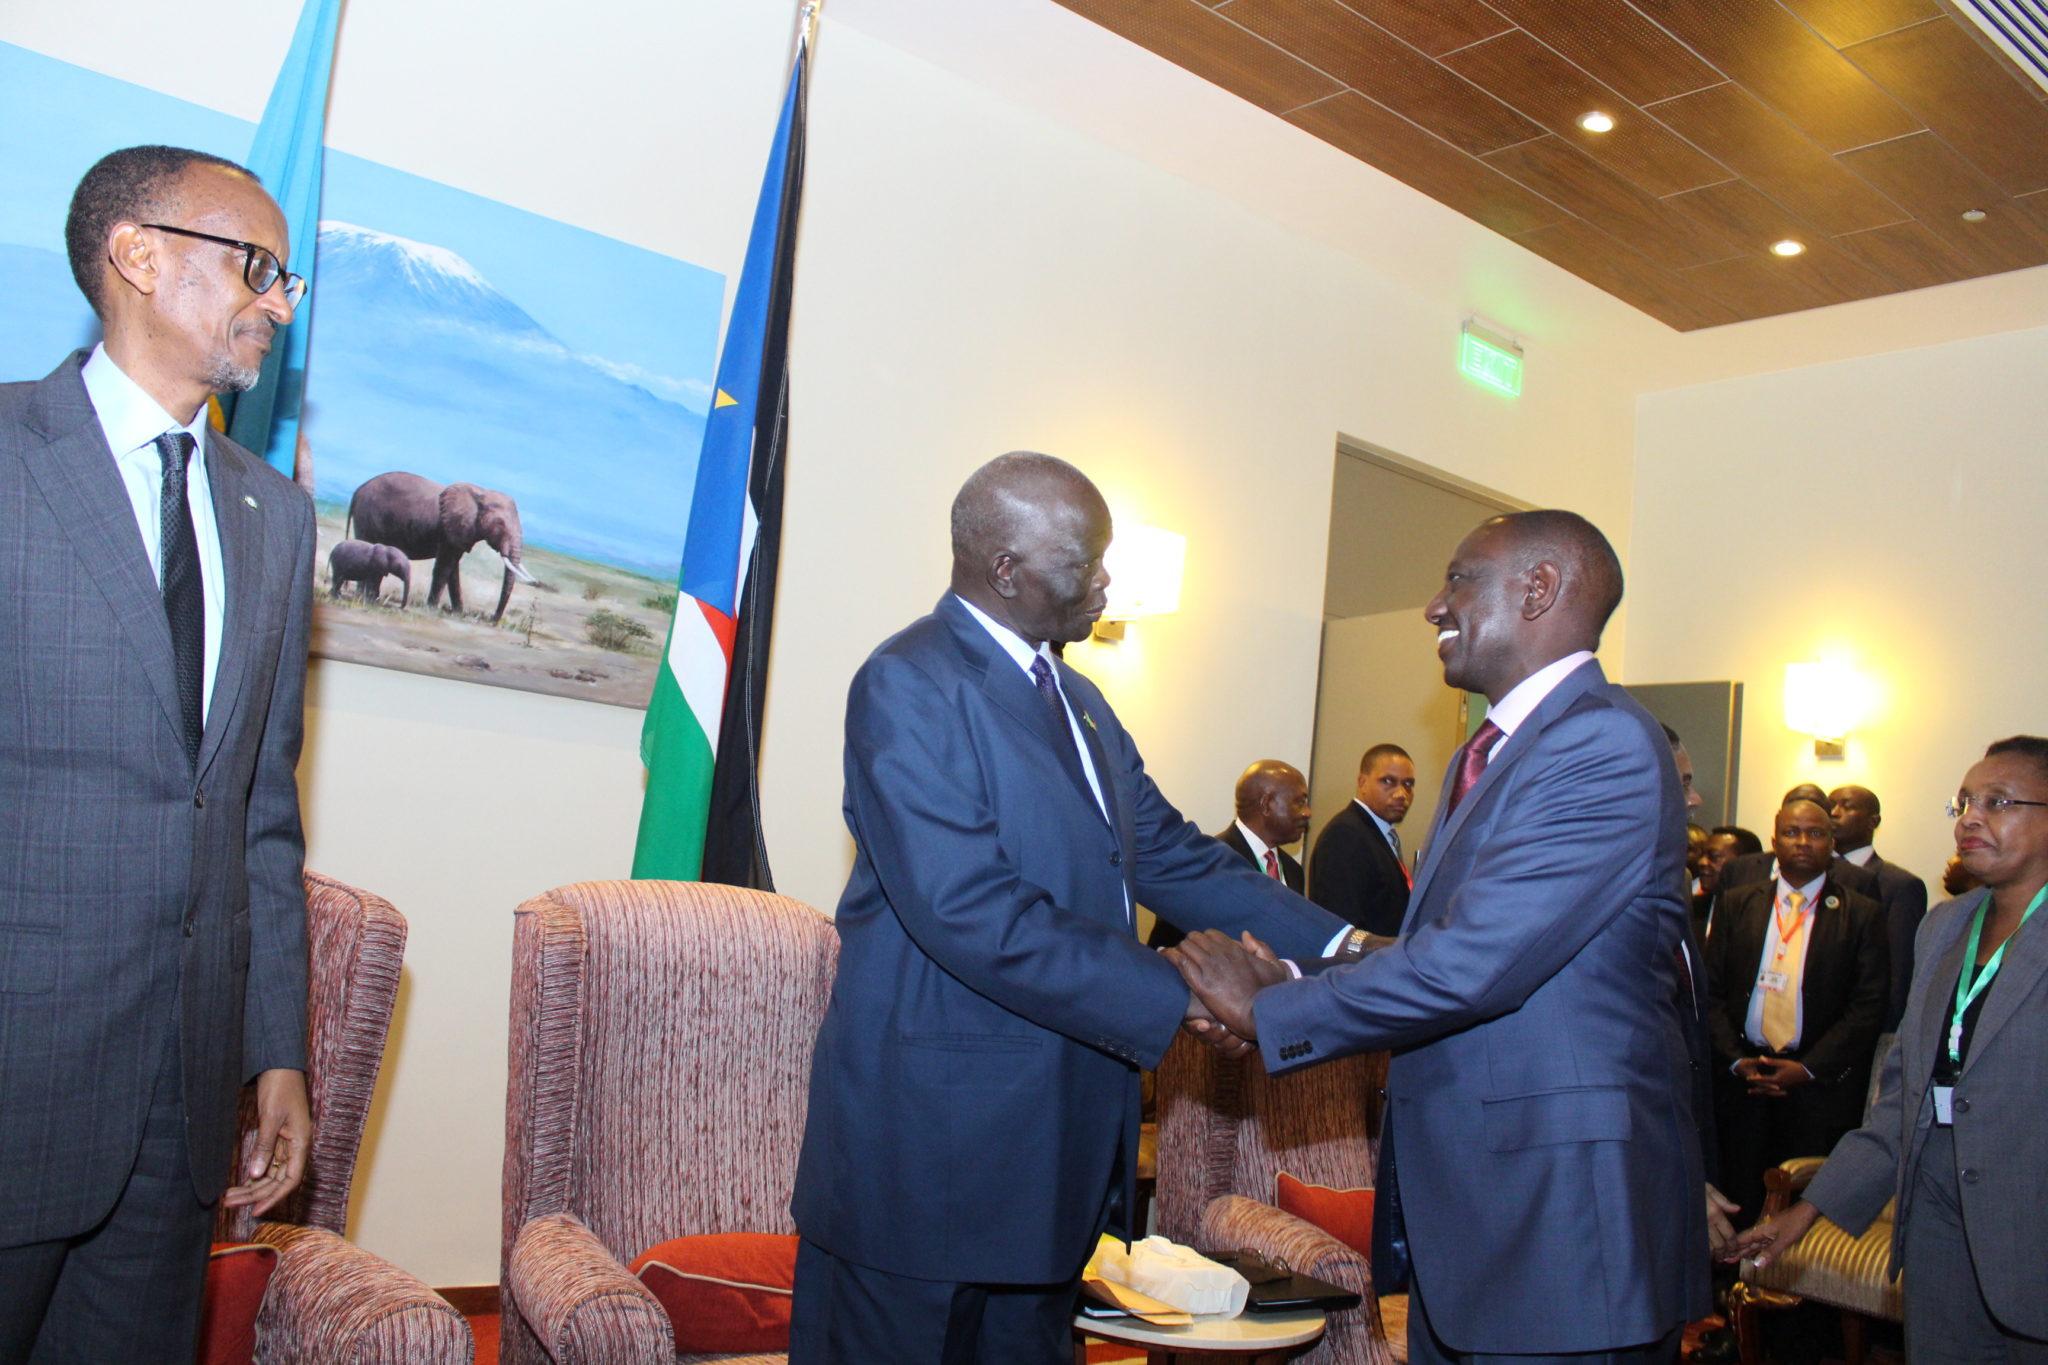 H.E Paul Kagame of the Republic of Rwanda, H. E. Hon. Aggrey Tisa Sabuni, Presidential Envoy of the Republic of South Sudan and H.E William Ruto, Deputy President The Republic of Kenya.